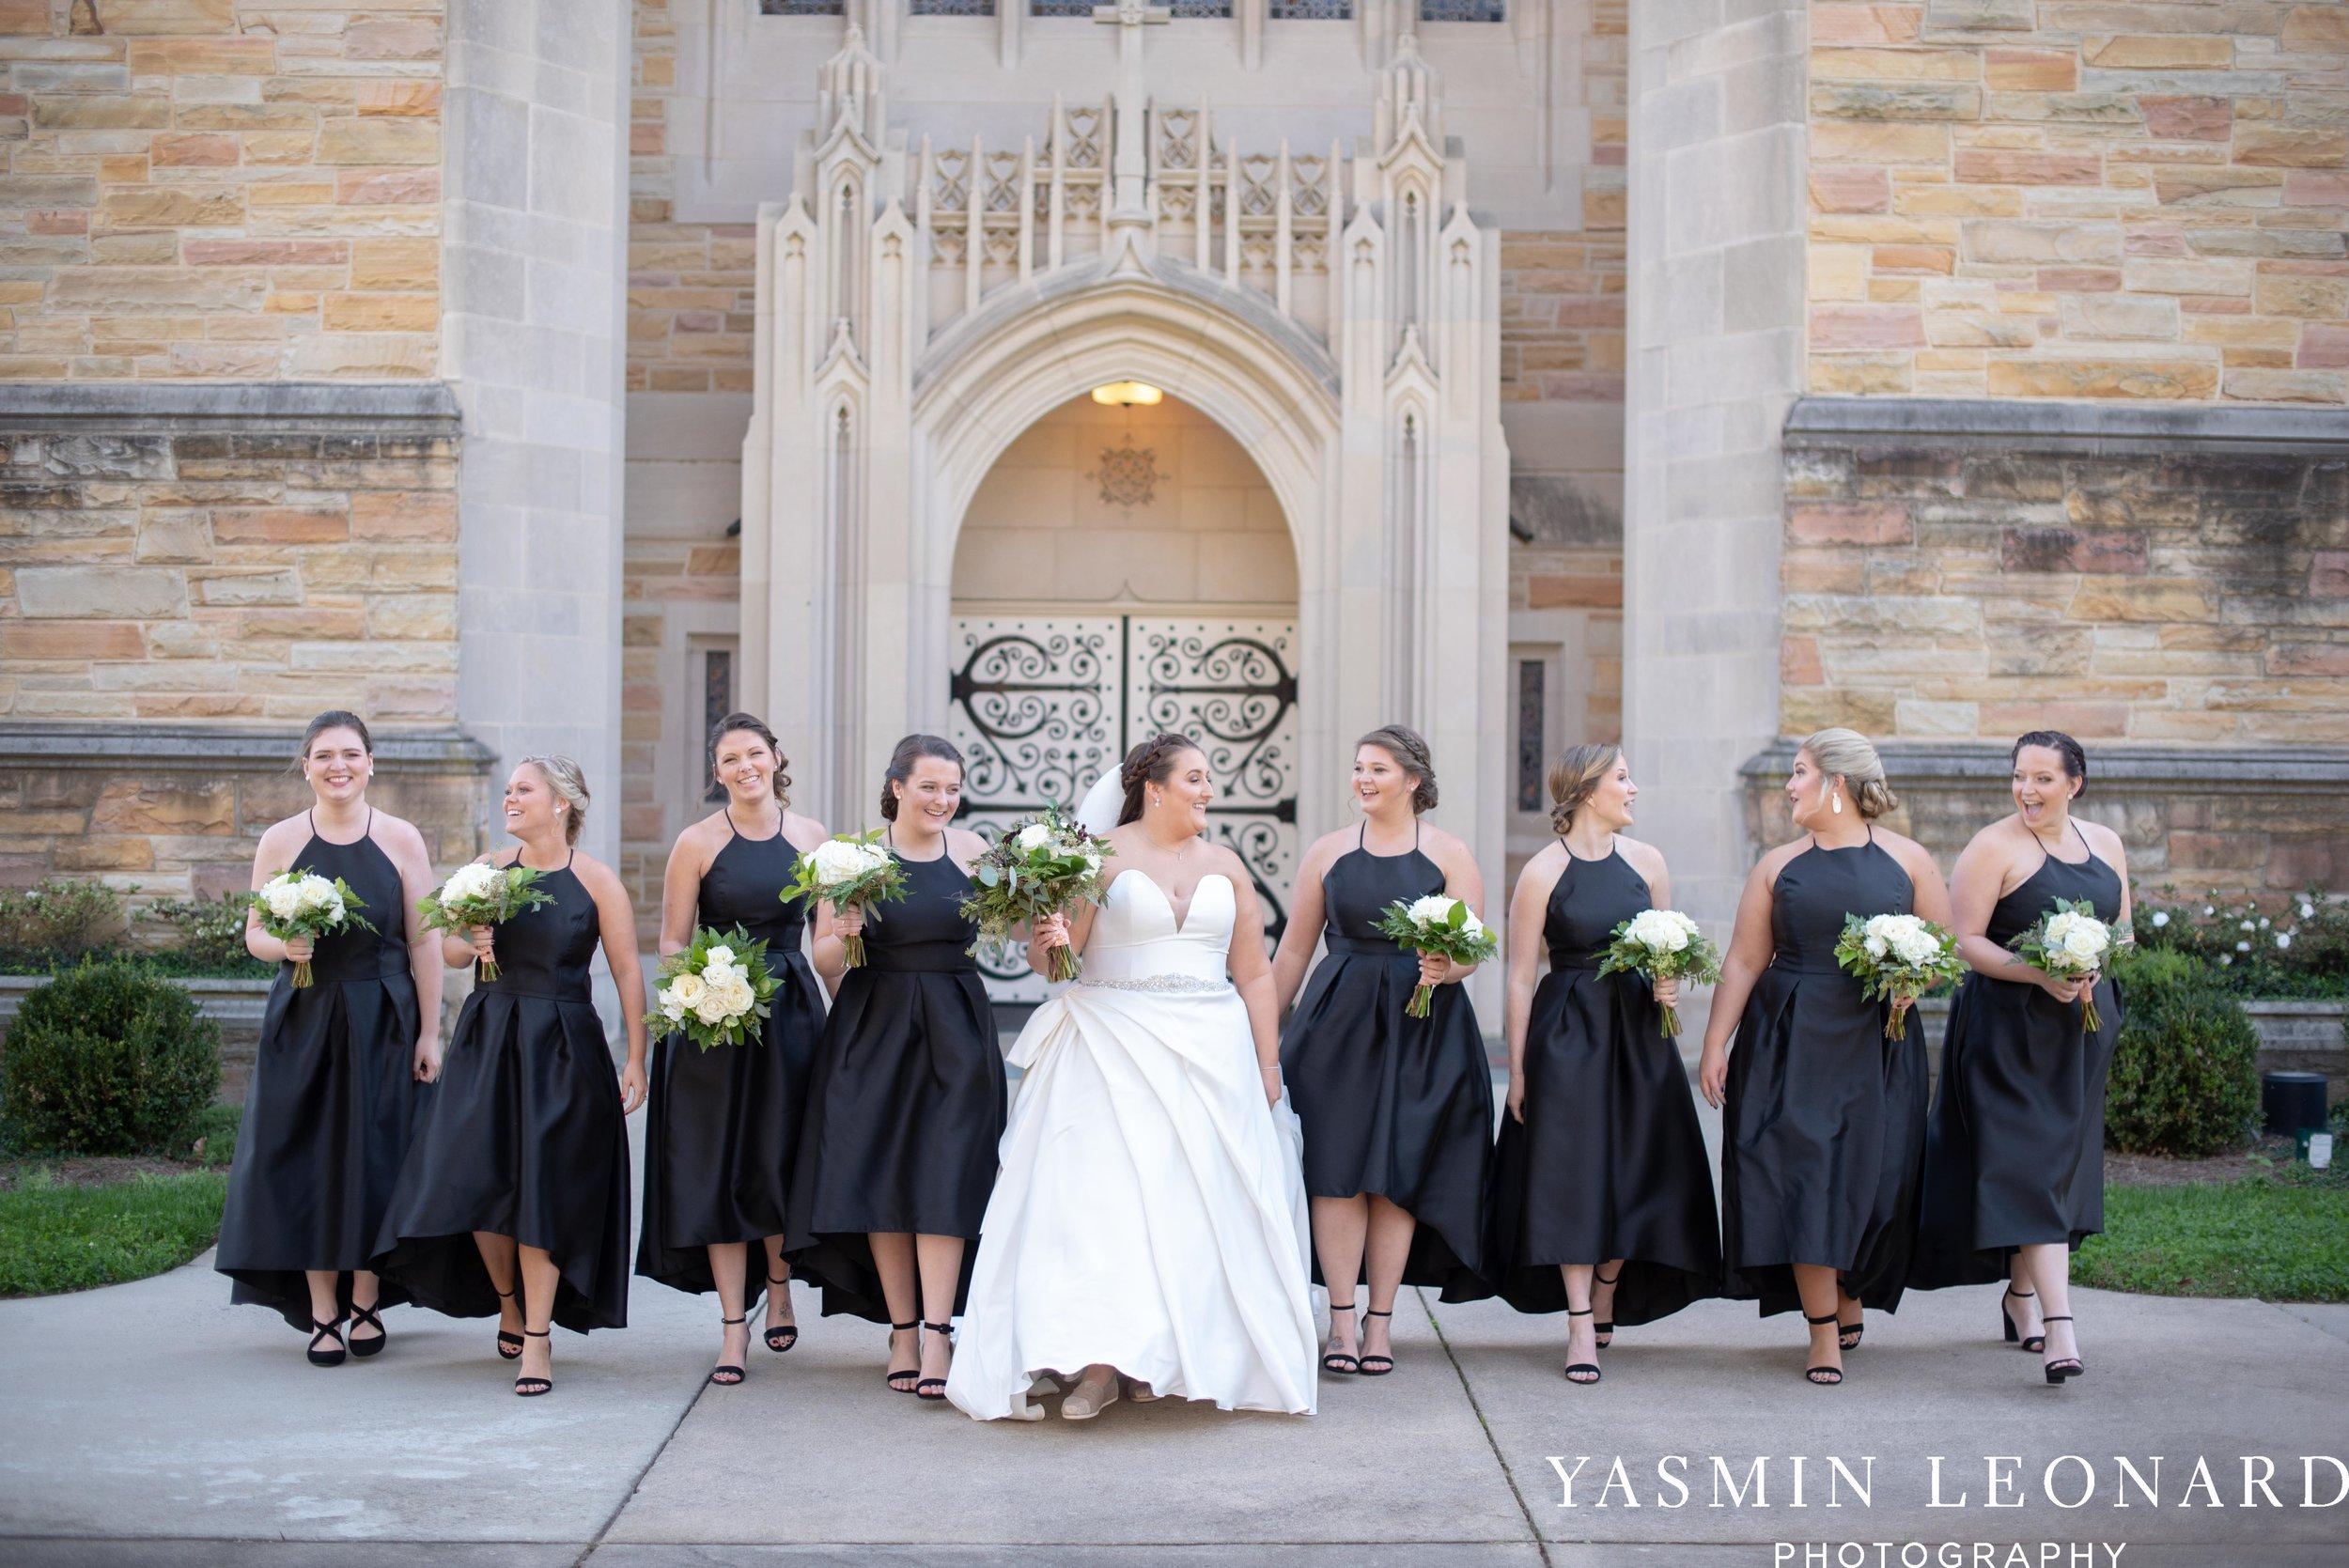 Wesley Memorial United Methodist Church - Old Homeplace Winery - High Point Weddings - High Point Wedding Photographer - NC Weddings - NC Barn Venue - Yasmin Leonard Photography-5.jpg